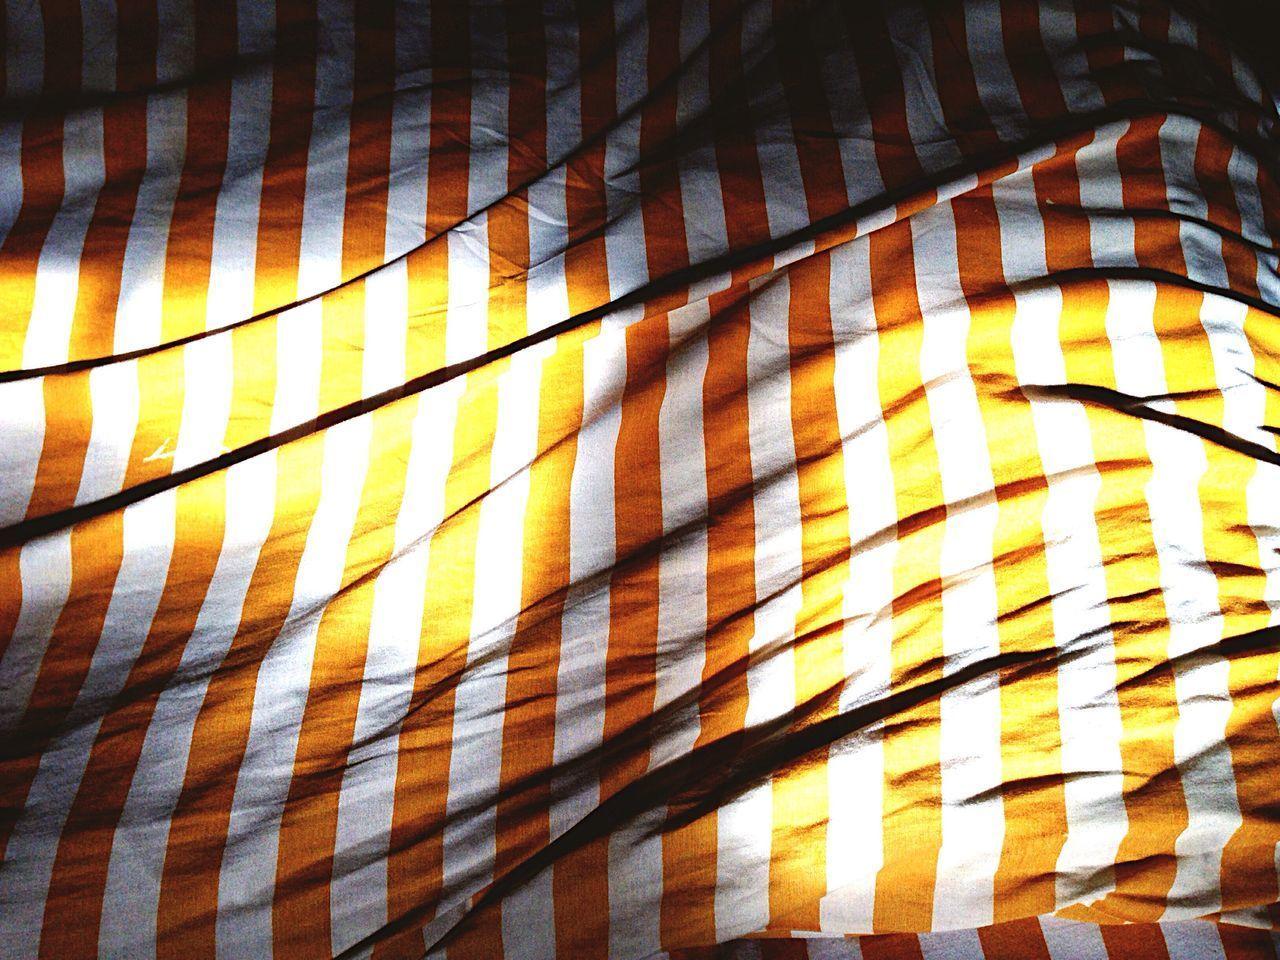 J'ai crevé l'oreiller - j'ai dû rêver trop fort XXXX Bashung Sunshine Froissée Nightmares